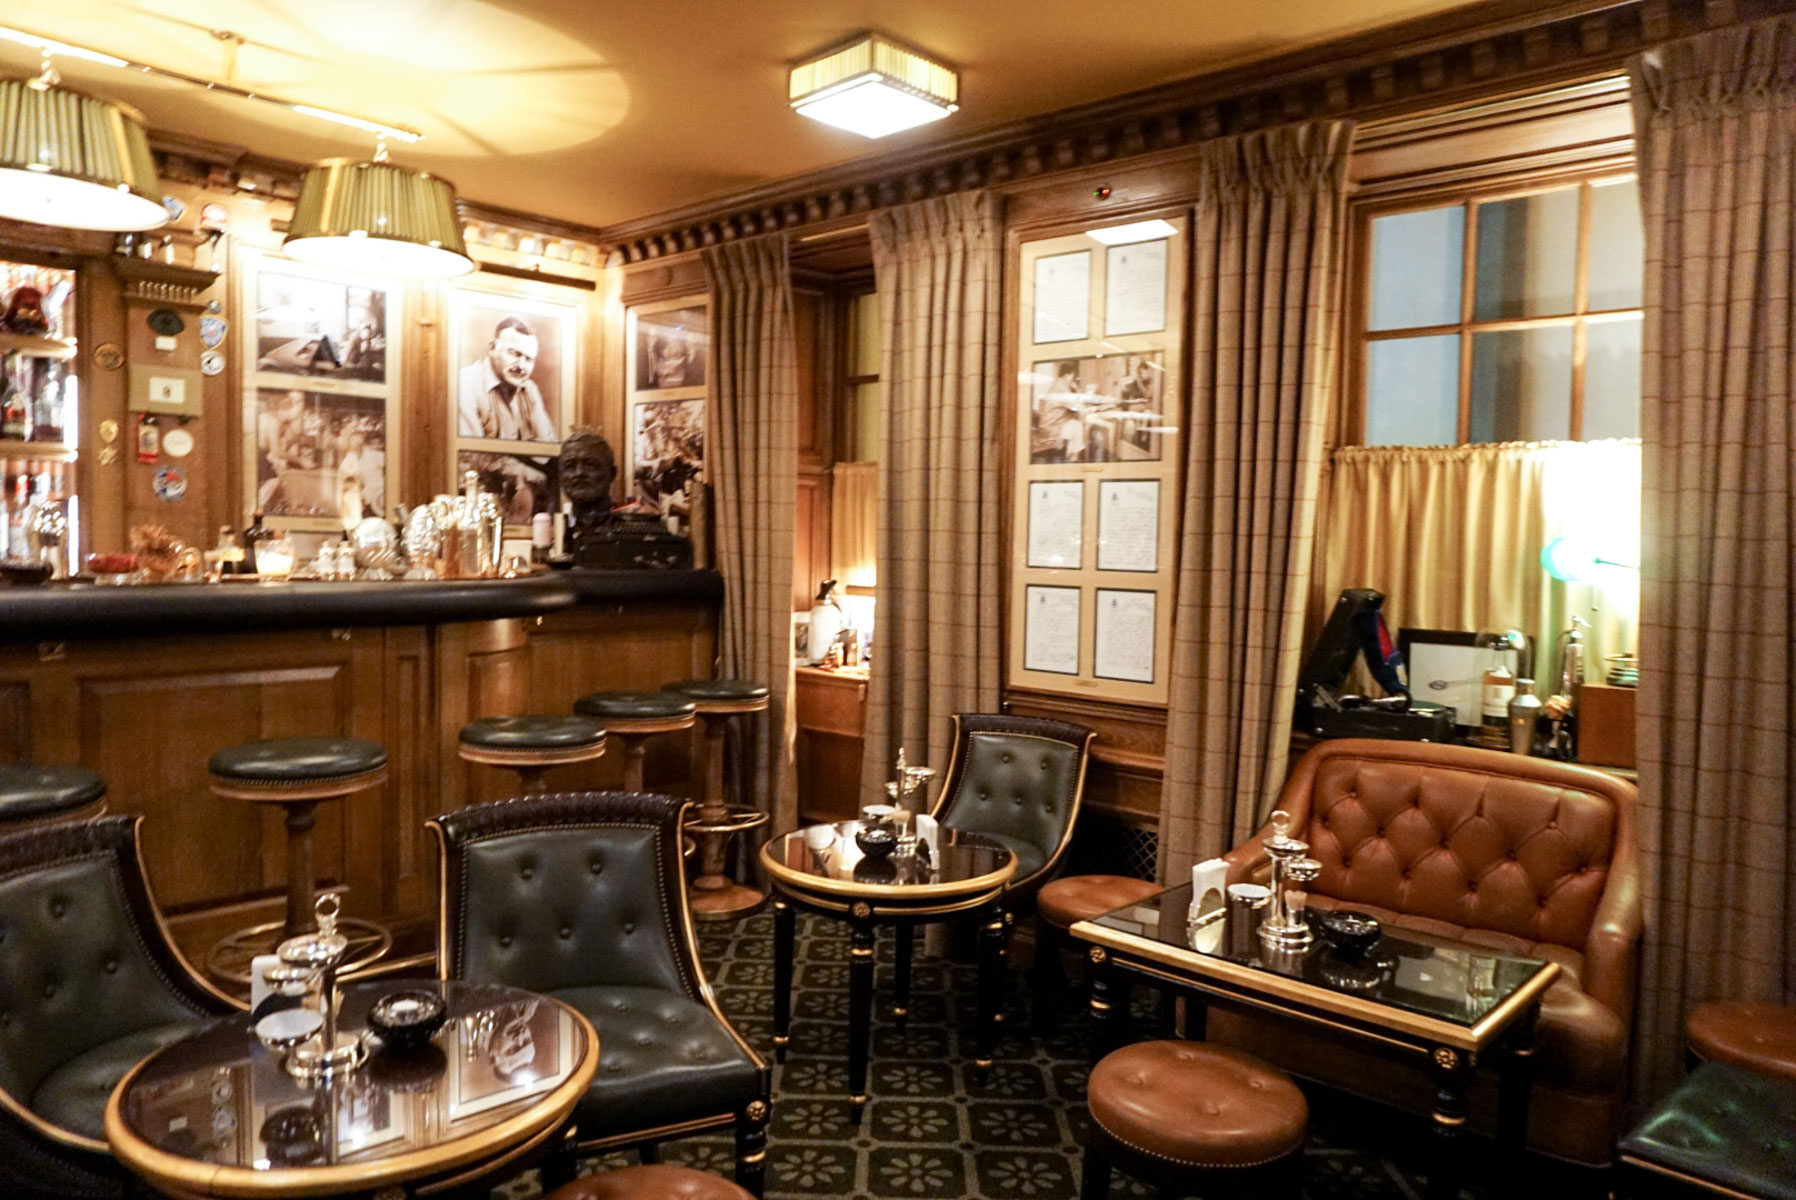 Hotel_Ritz_Paris_Trip_to_Paris-2543.jpg